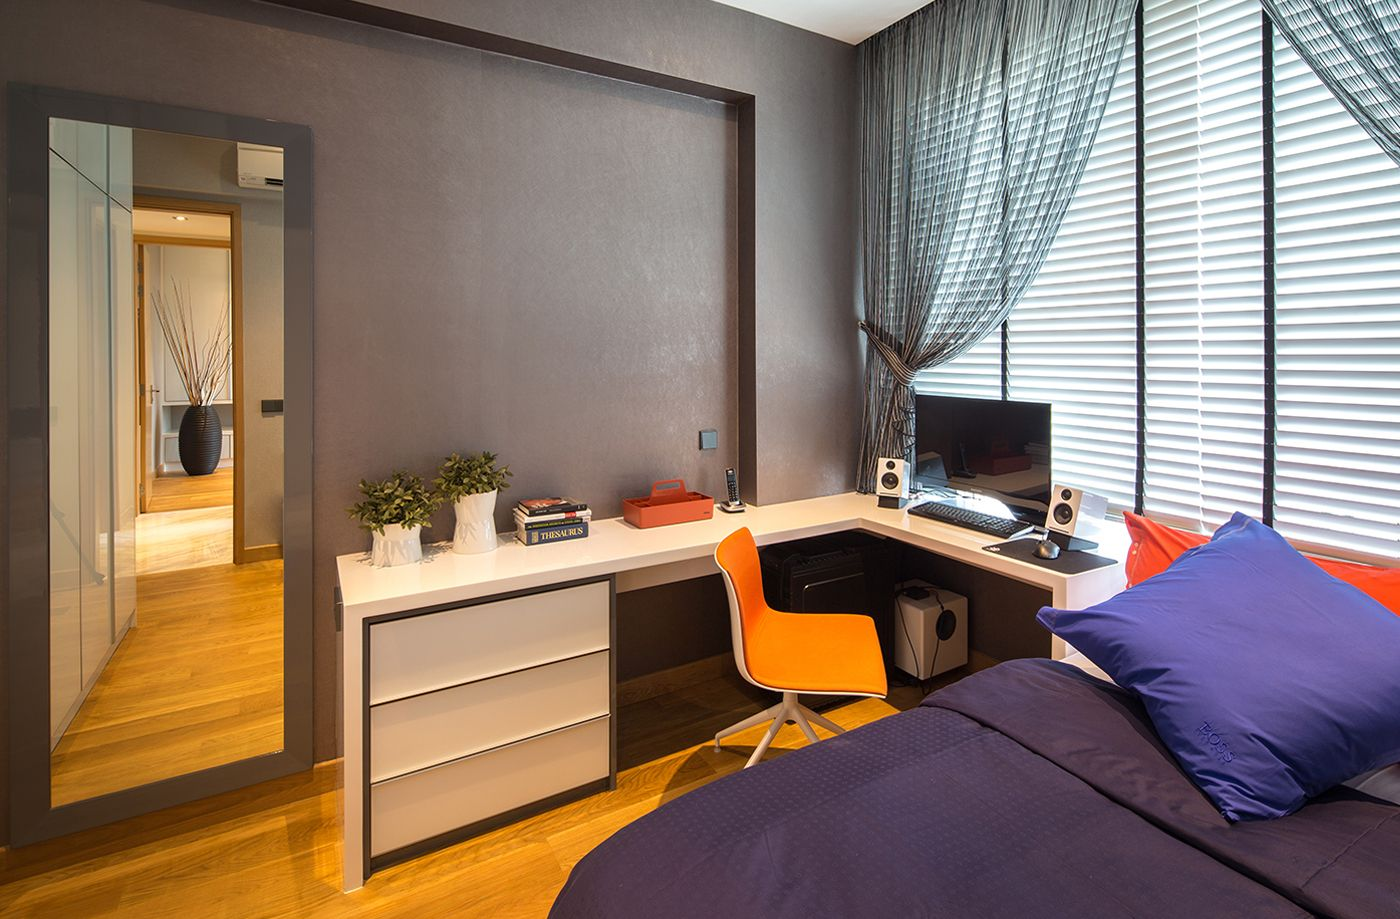 syrb makena #syrb #modern #interior #design #statuario #bedhead